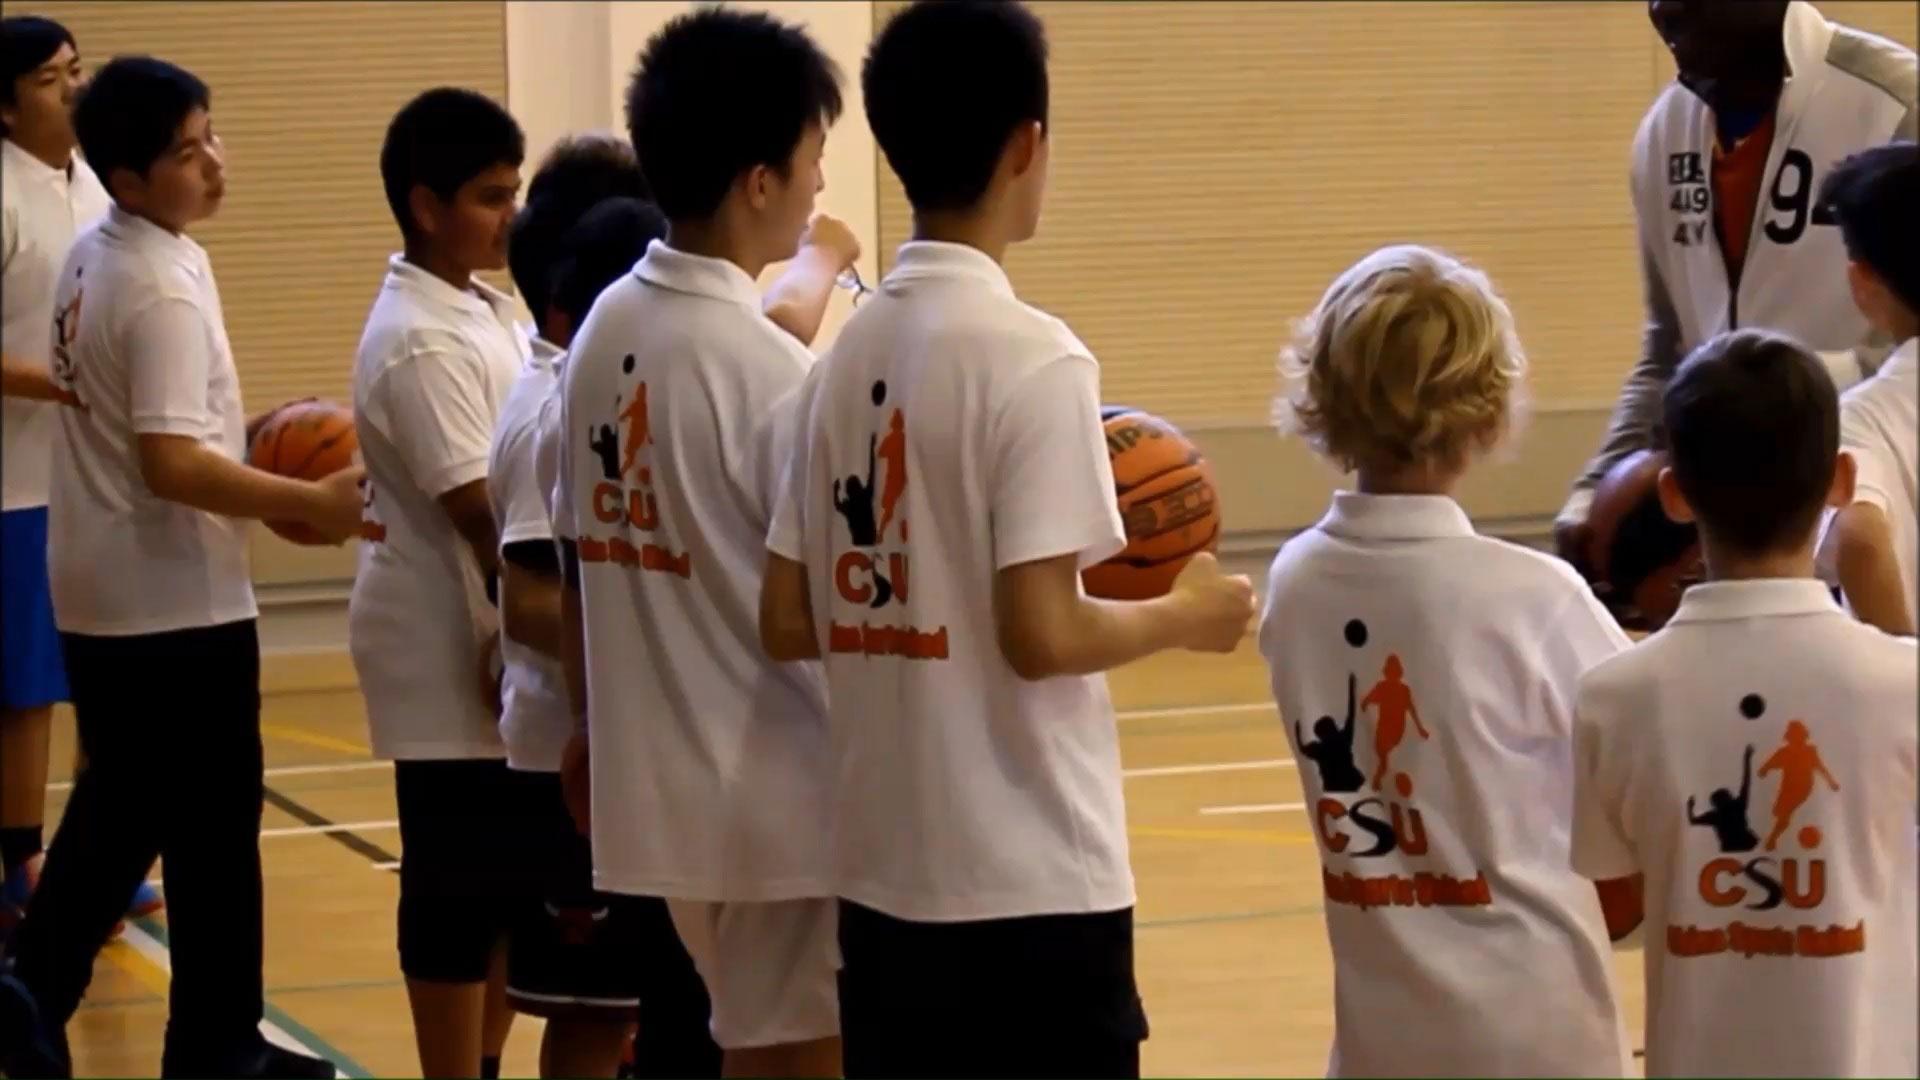 FRONTPAGE-2-足球篮球游泳运动上海儿童青少年网球舞蹈芭蕾舞学校2-VIDEO-PICTURE-IMAGE